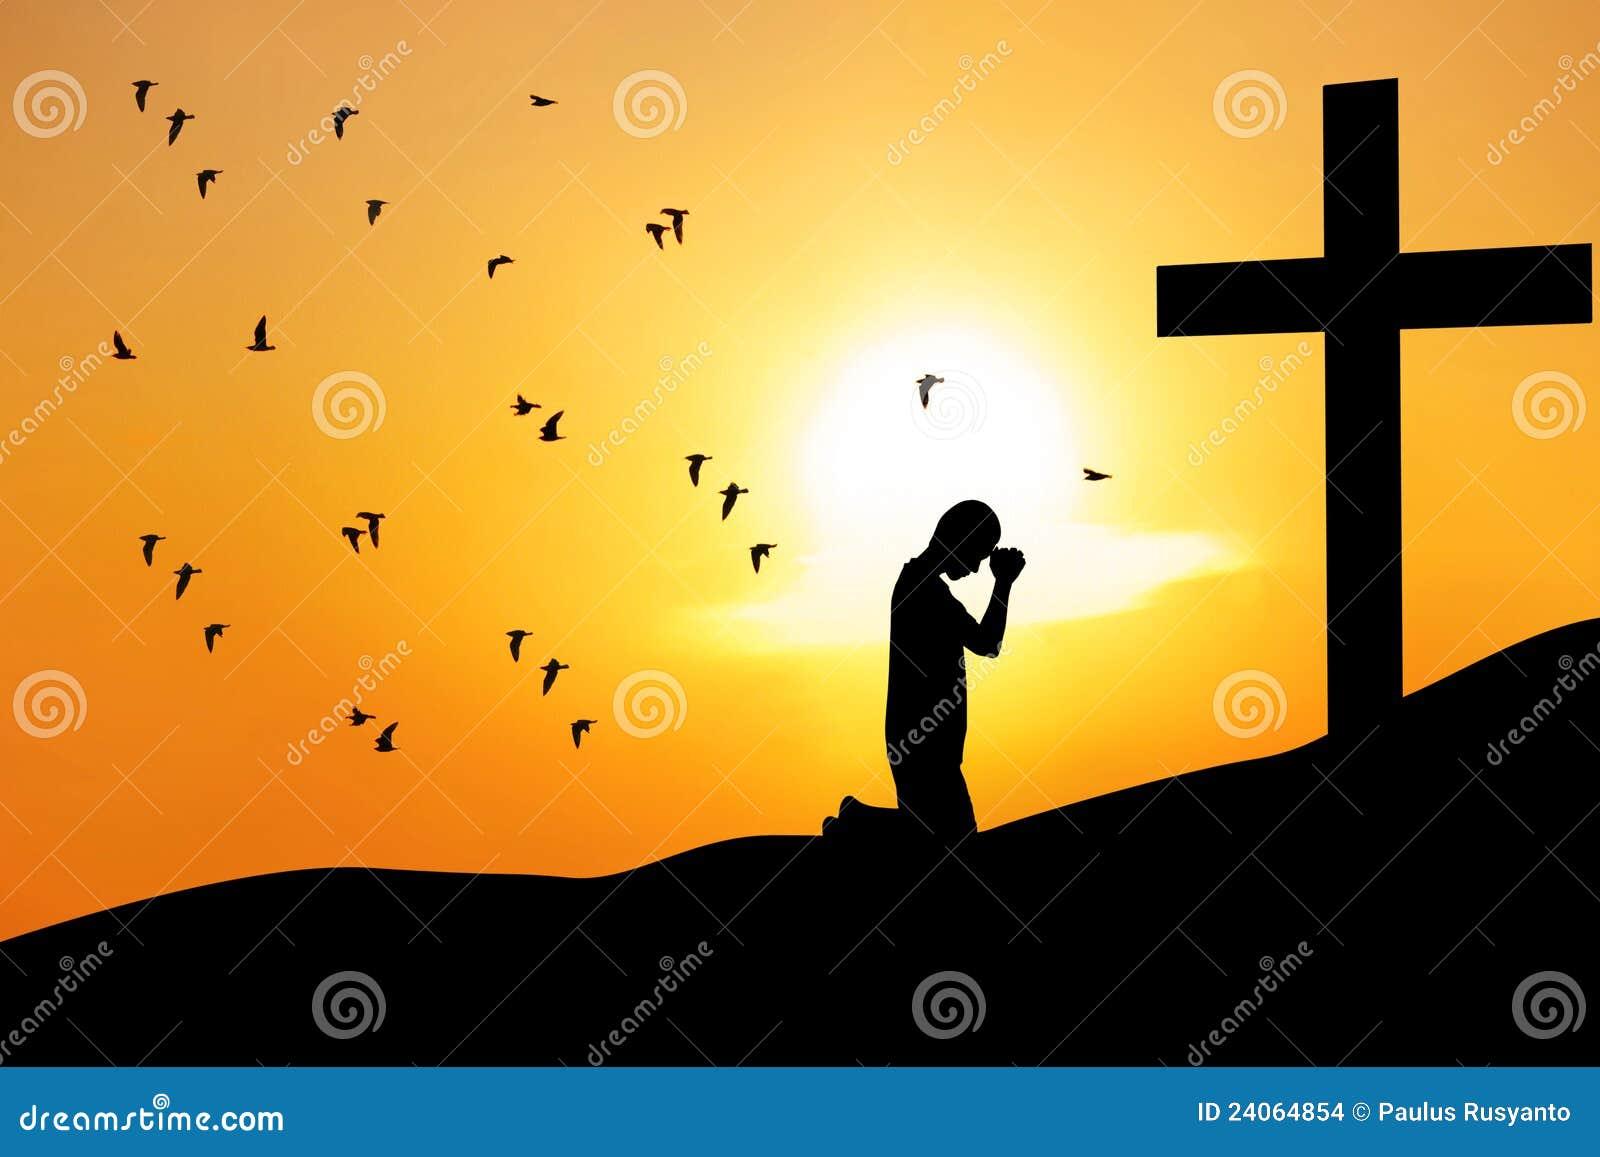 Christian background: man praying under the cross